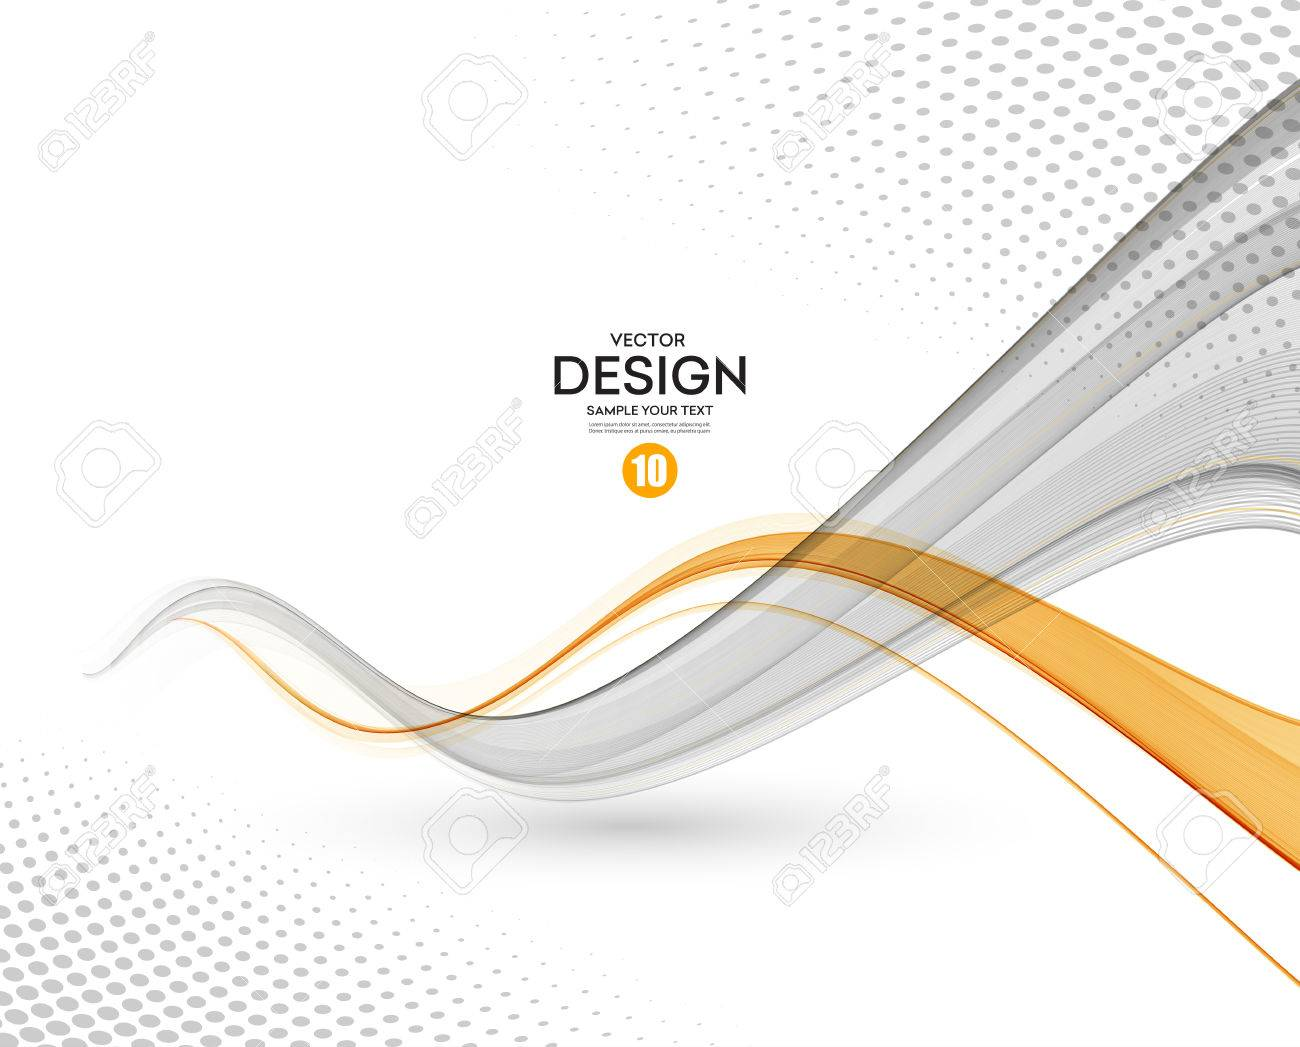 Abstract vector background, gray and orange waved lines for brochure, website, flyer design. illustration eps10 - 56342953